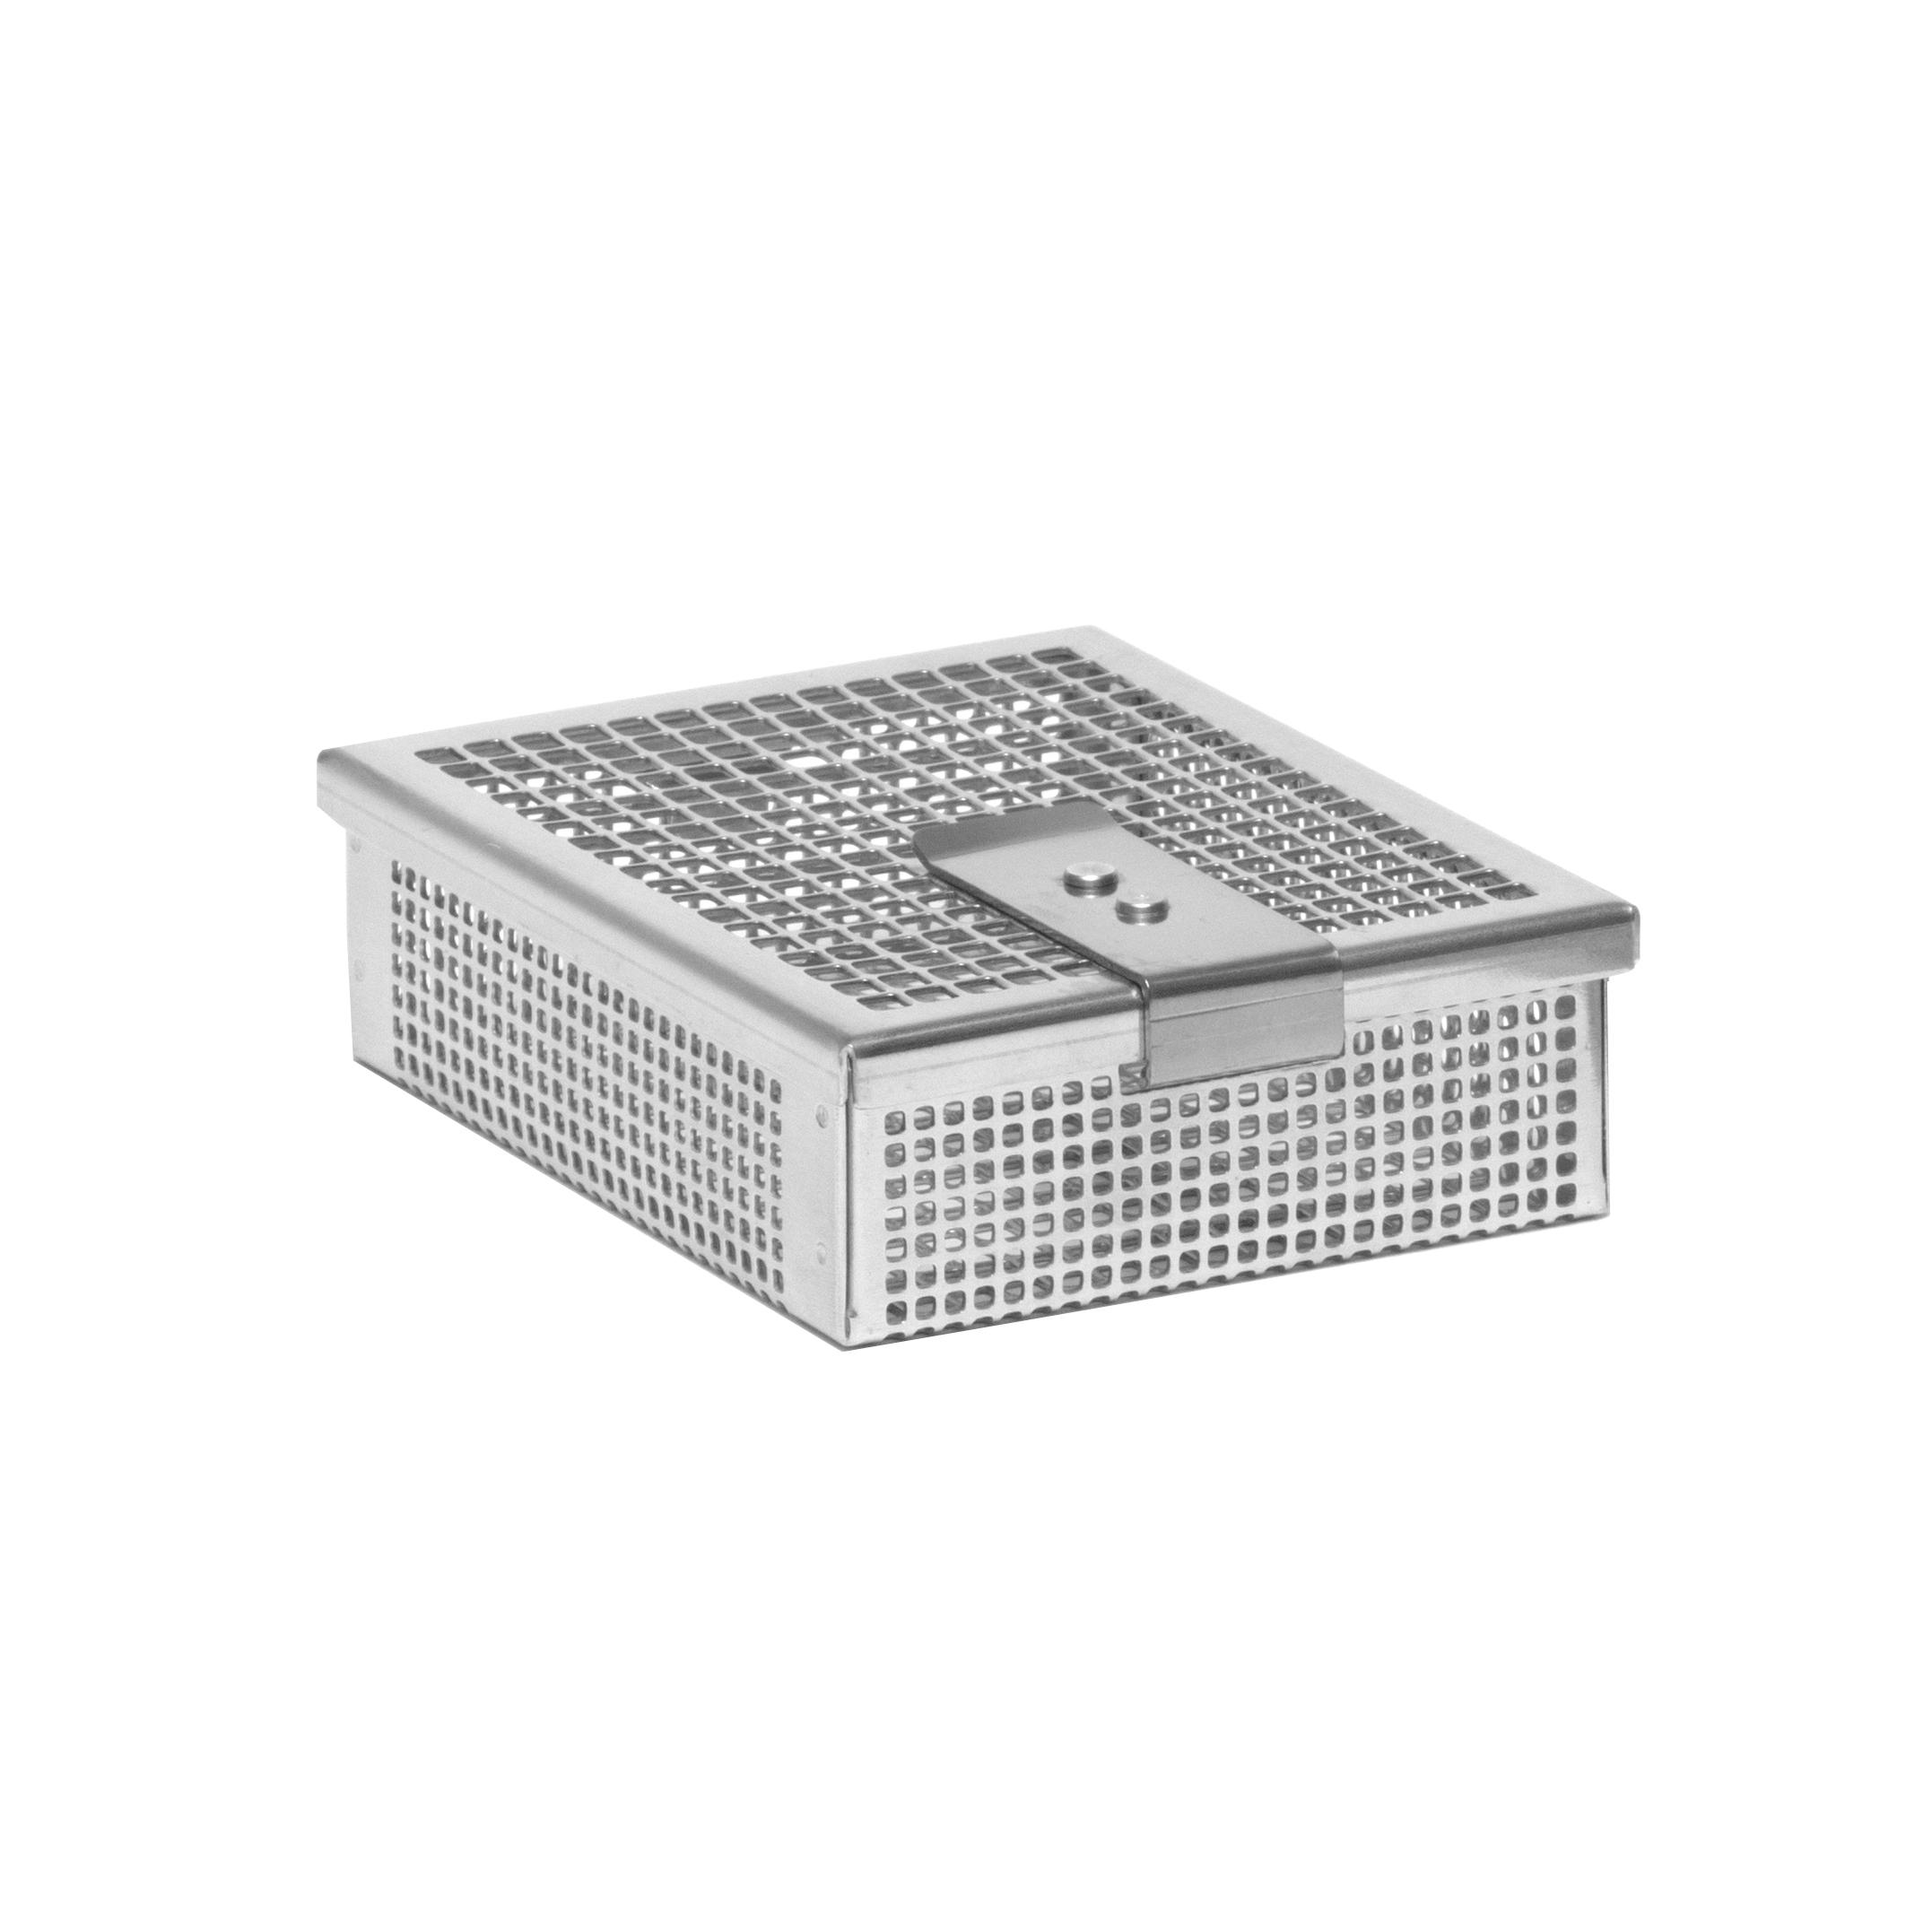 Mini Basket with Lid Image